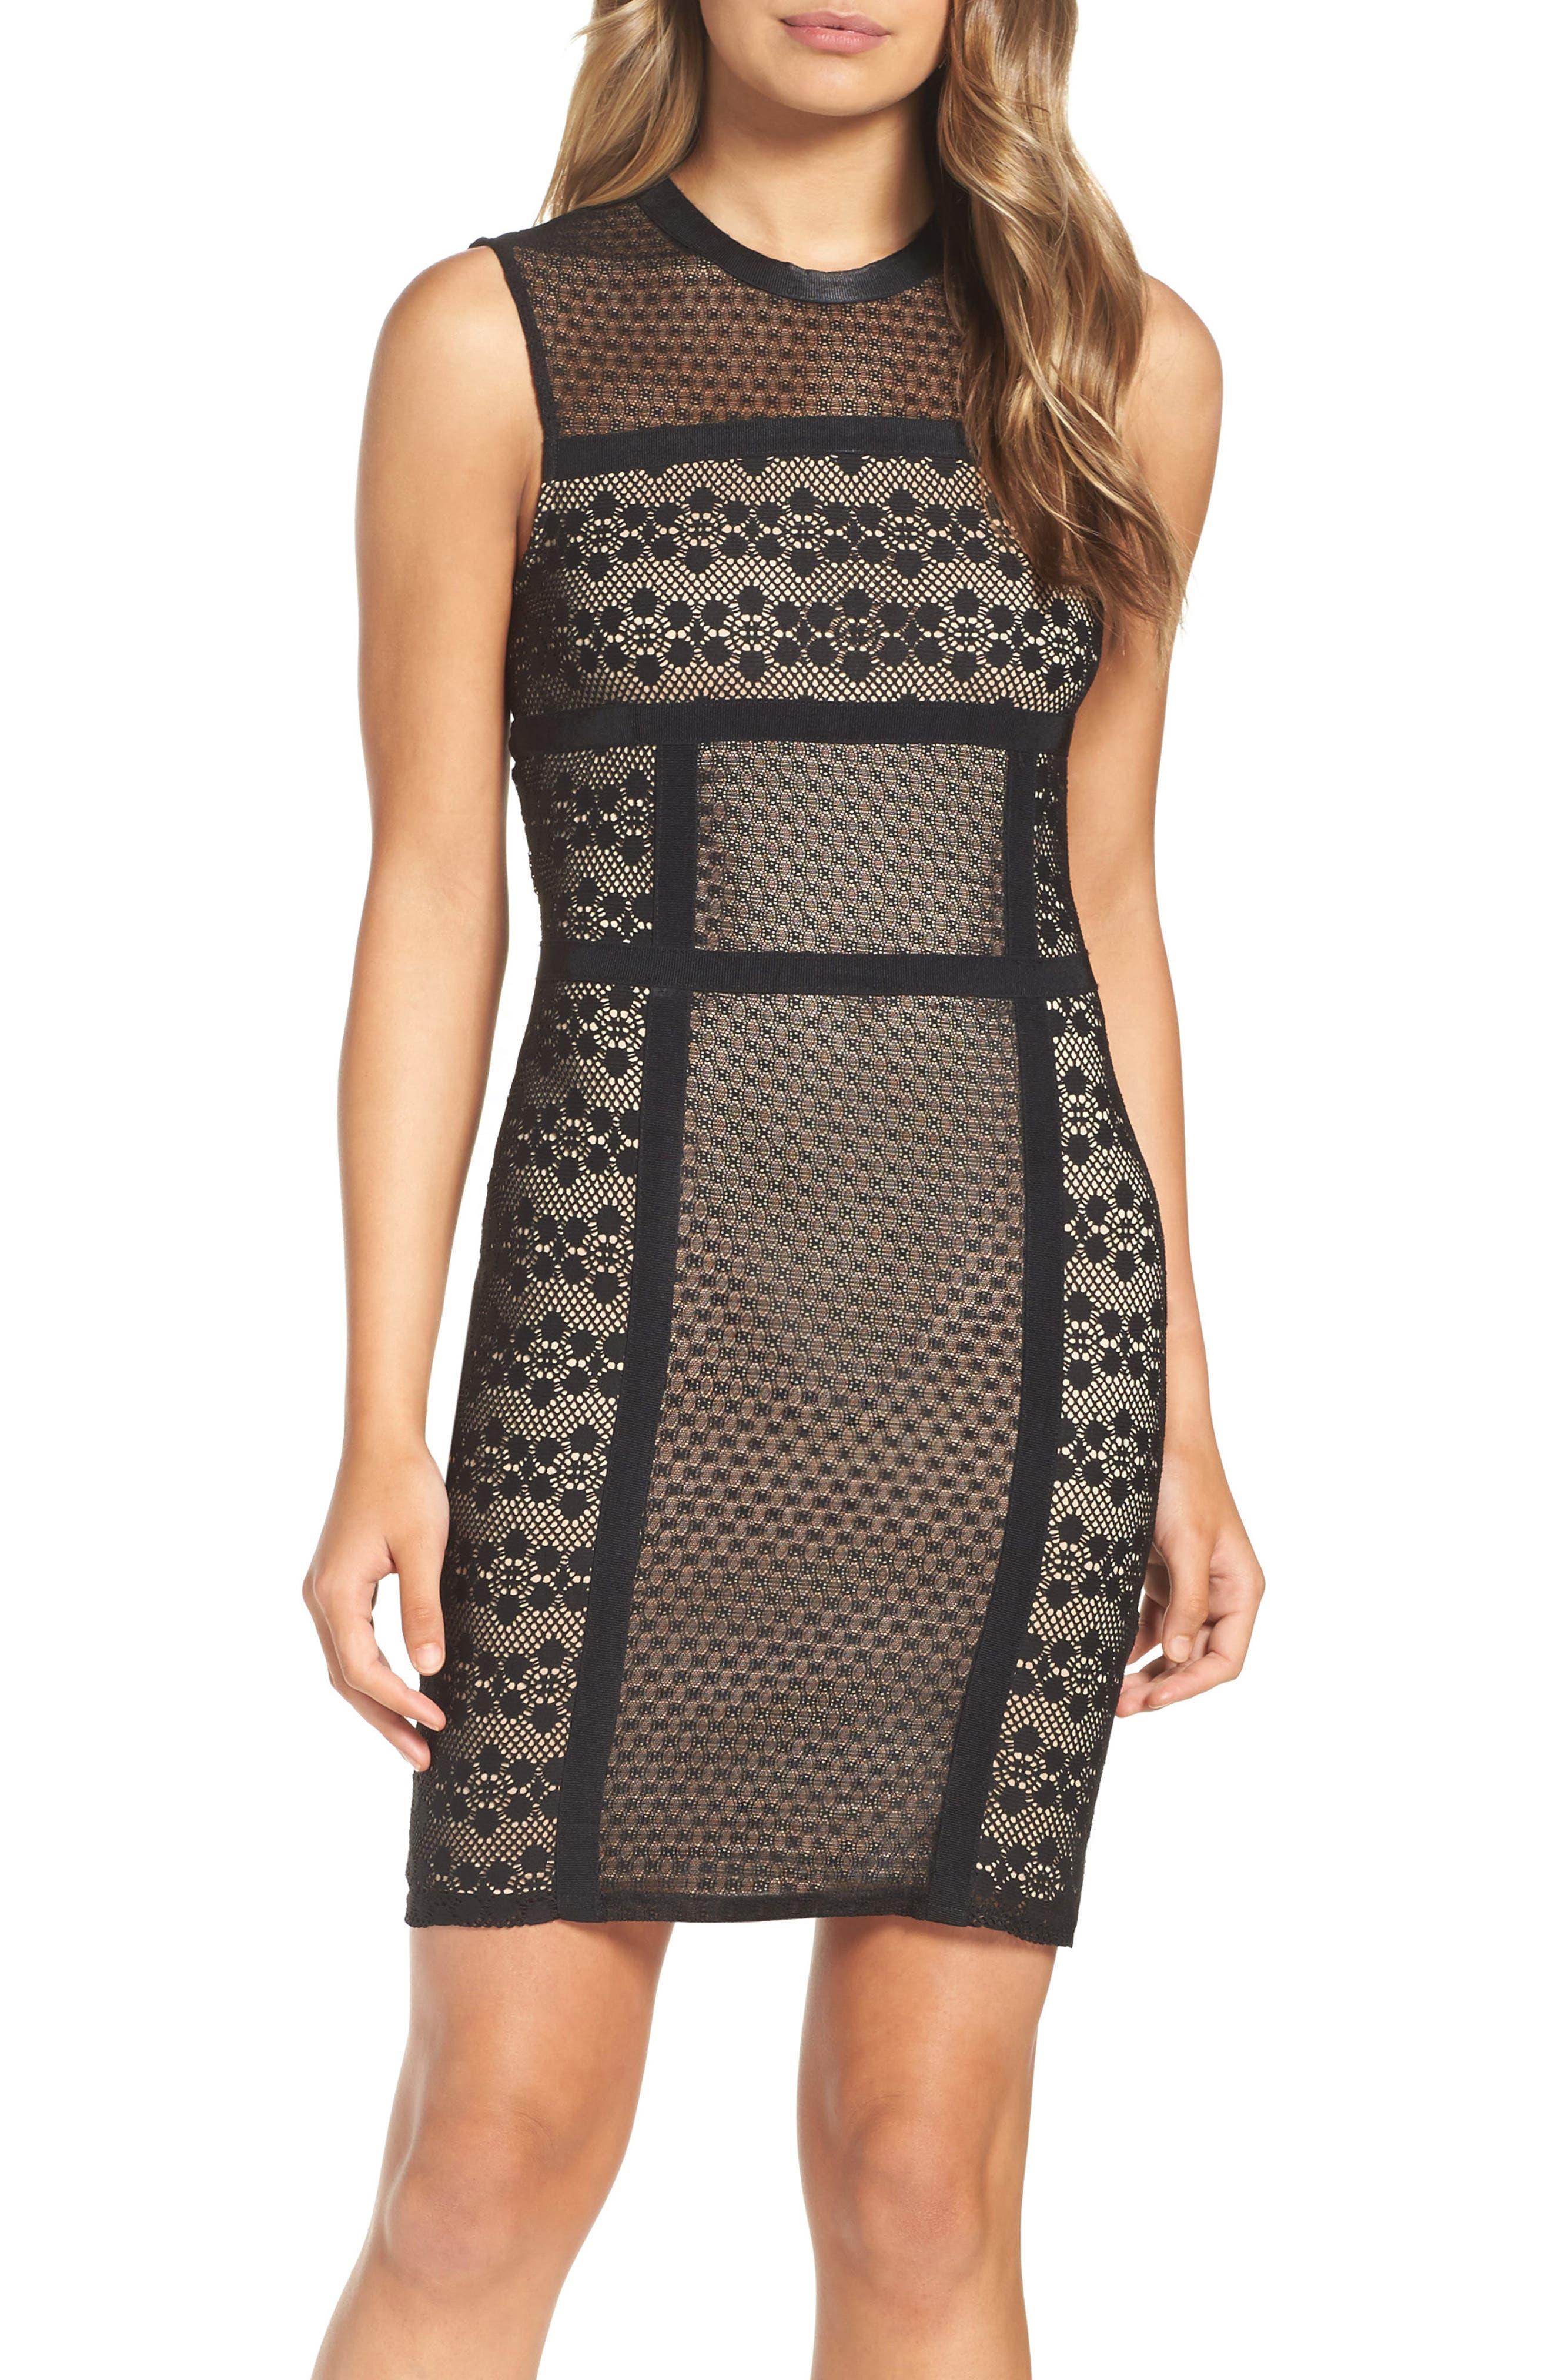 Hola Mamacita Body-Con Dress,                         Main,                         color, Black